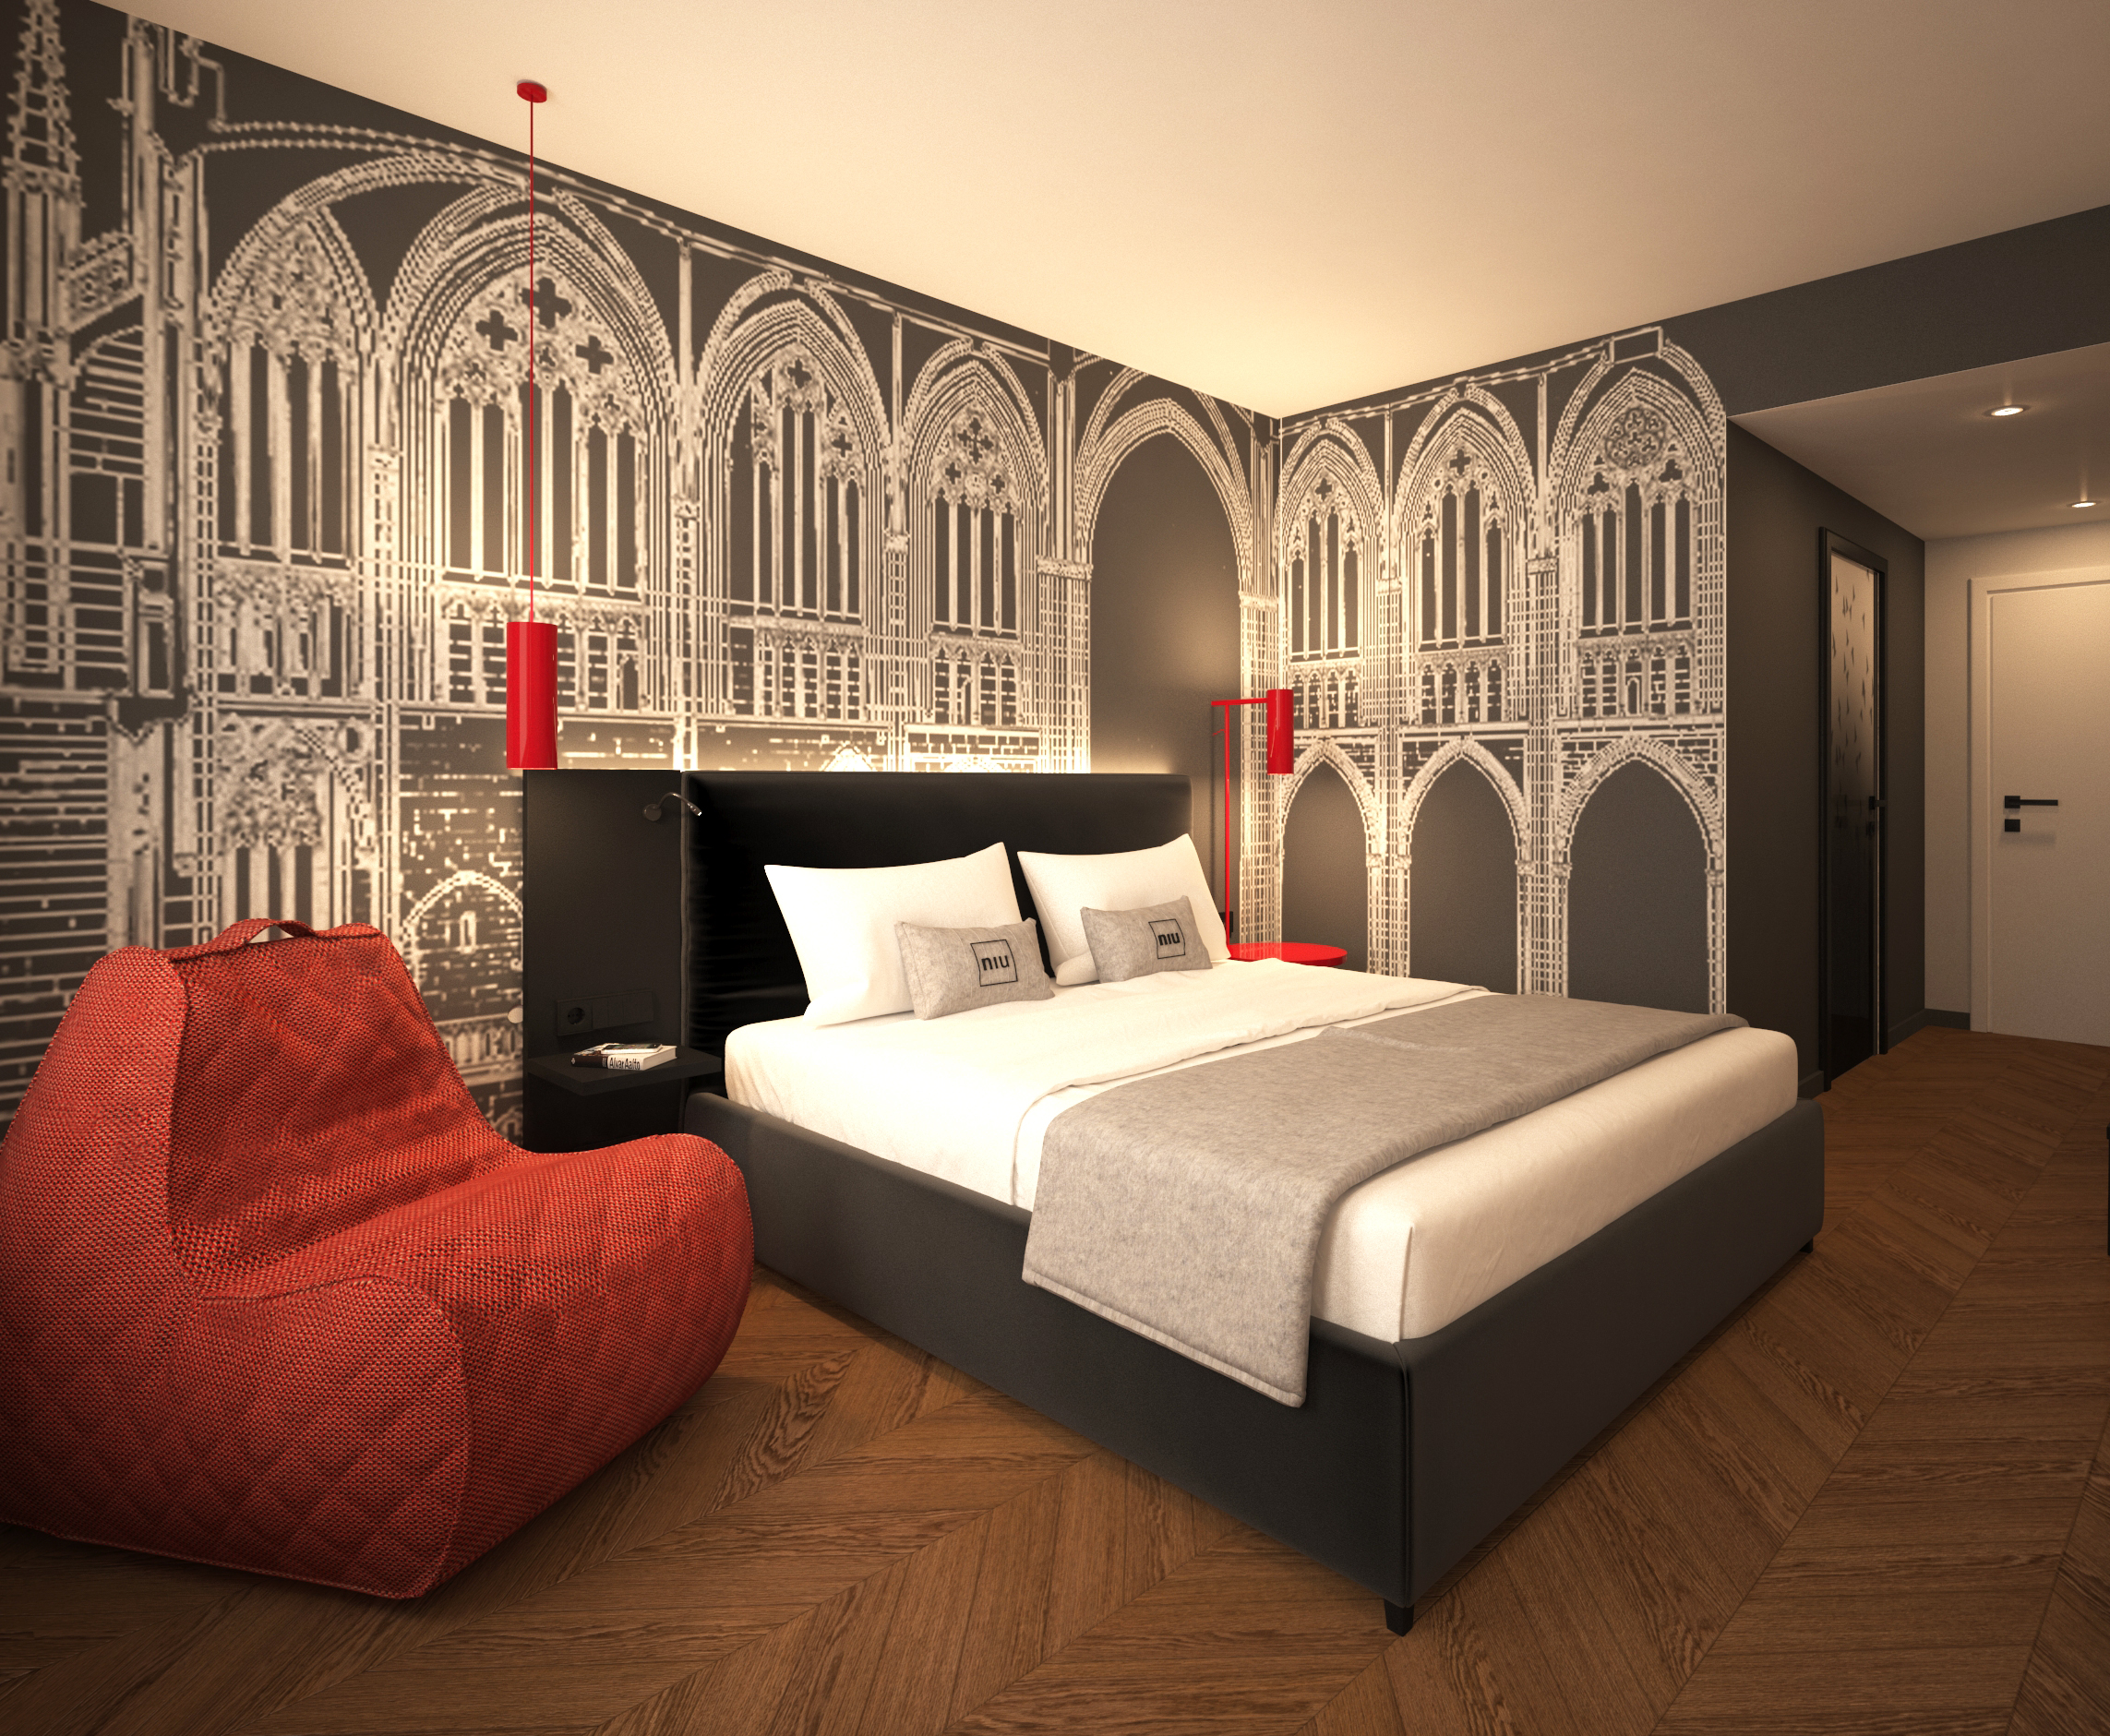 Neuer Standort: NOVUM Hospitality plant ein niu-Hotel in Regensburg ...